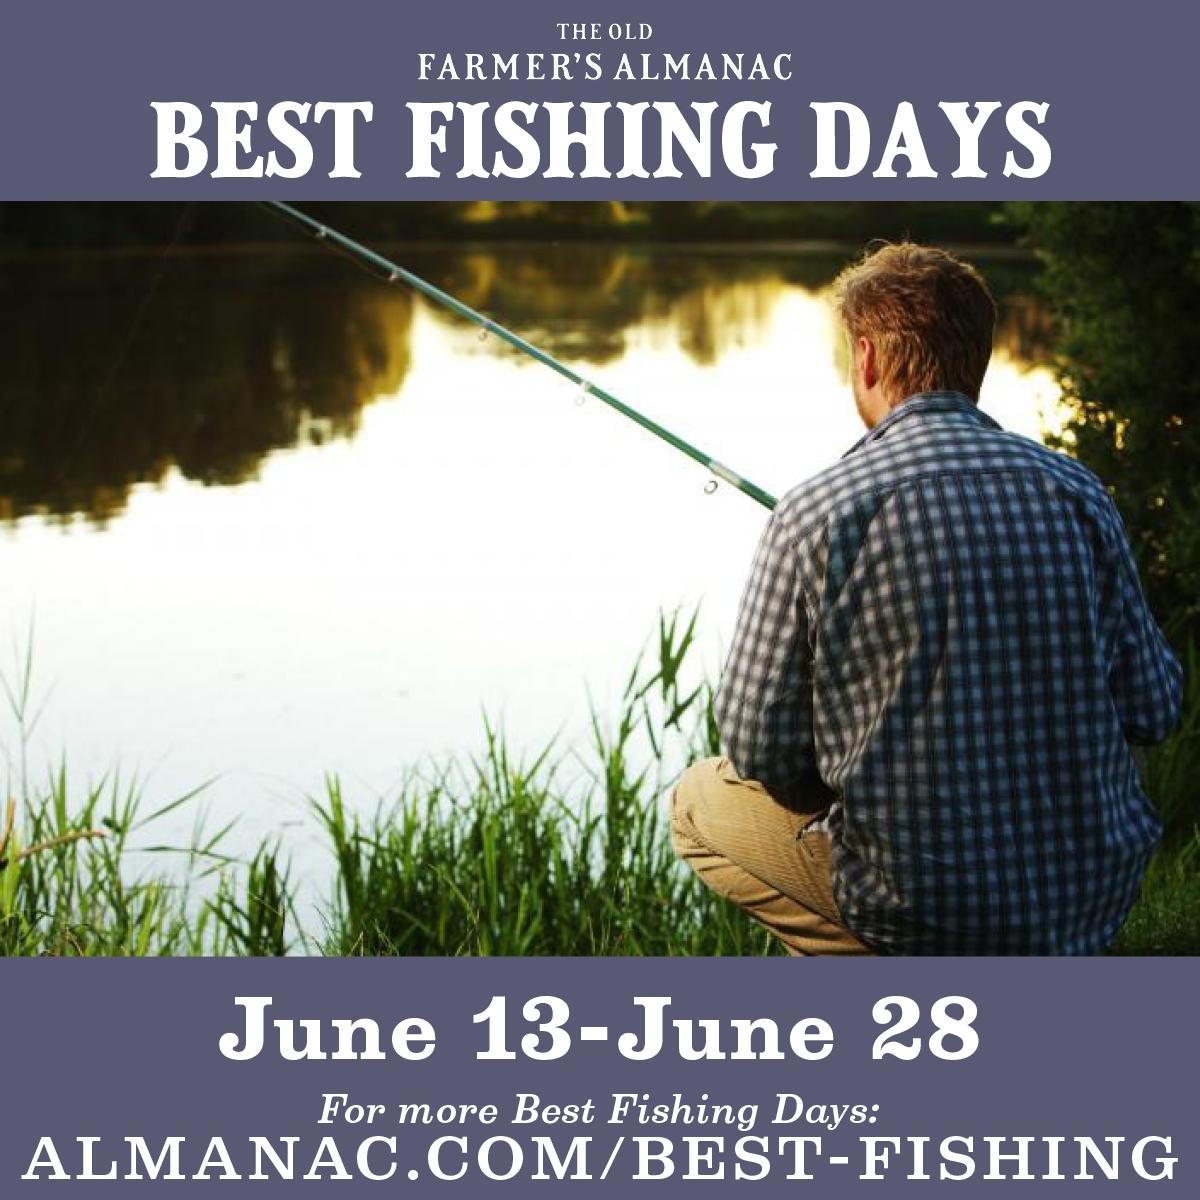 Fishing Calendar For 2020 | Best Fishing Days, Farmers